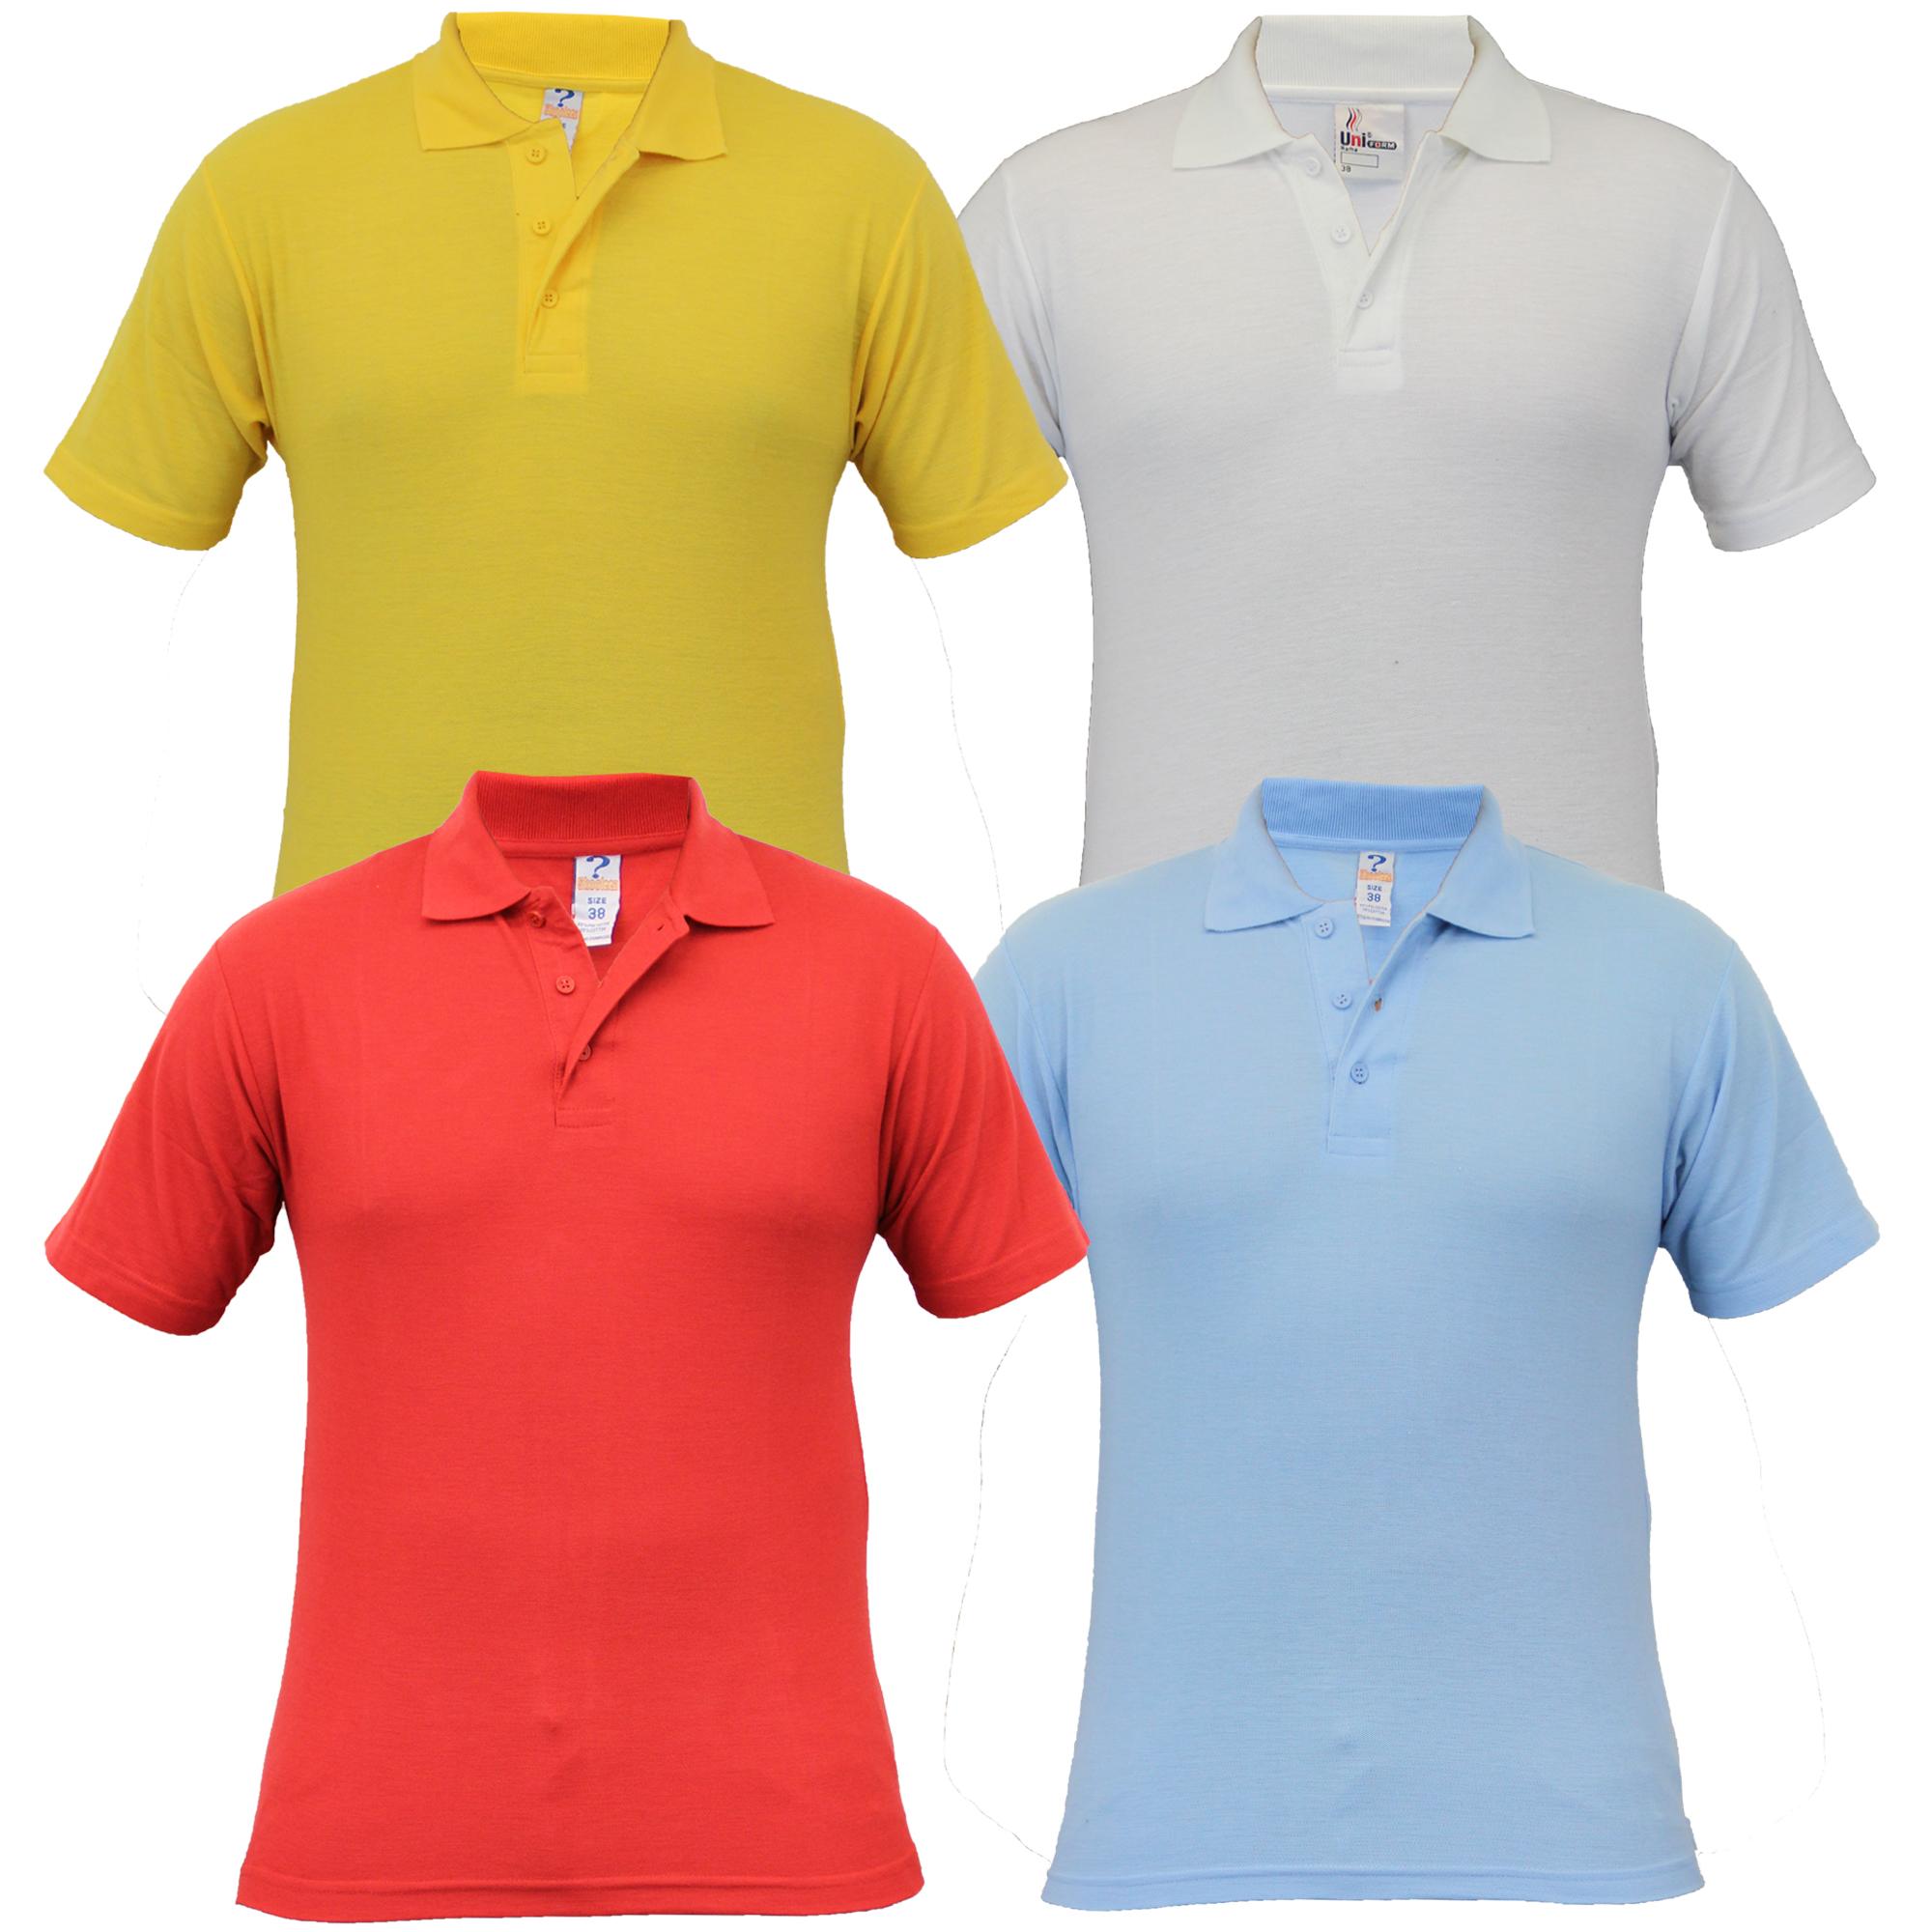 boys 2 pack polo t shirts school uniform pique kids